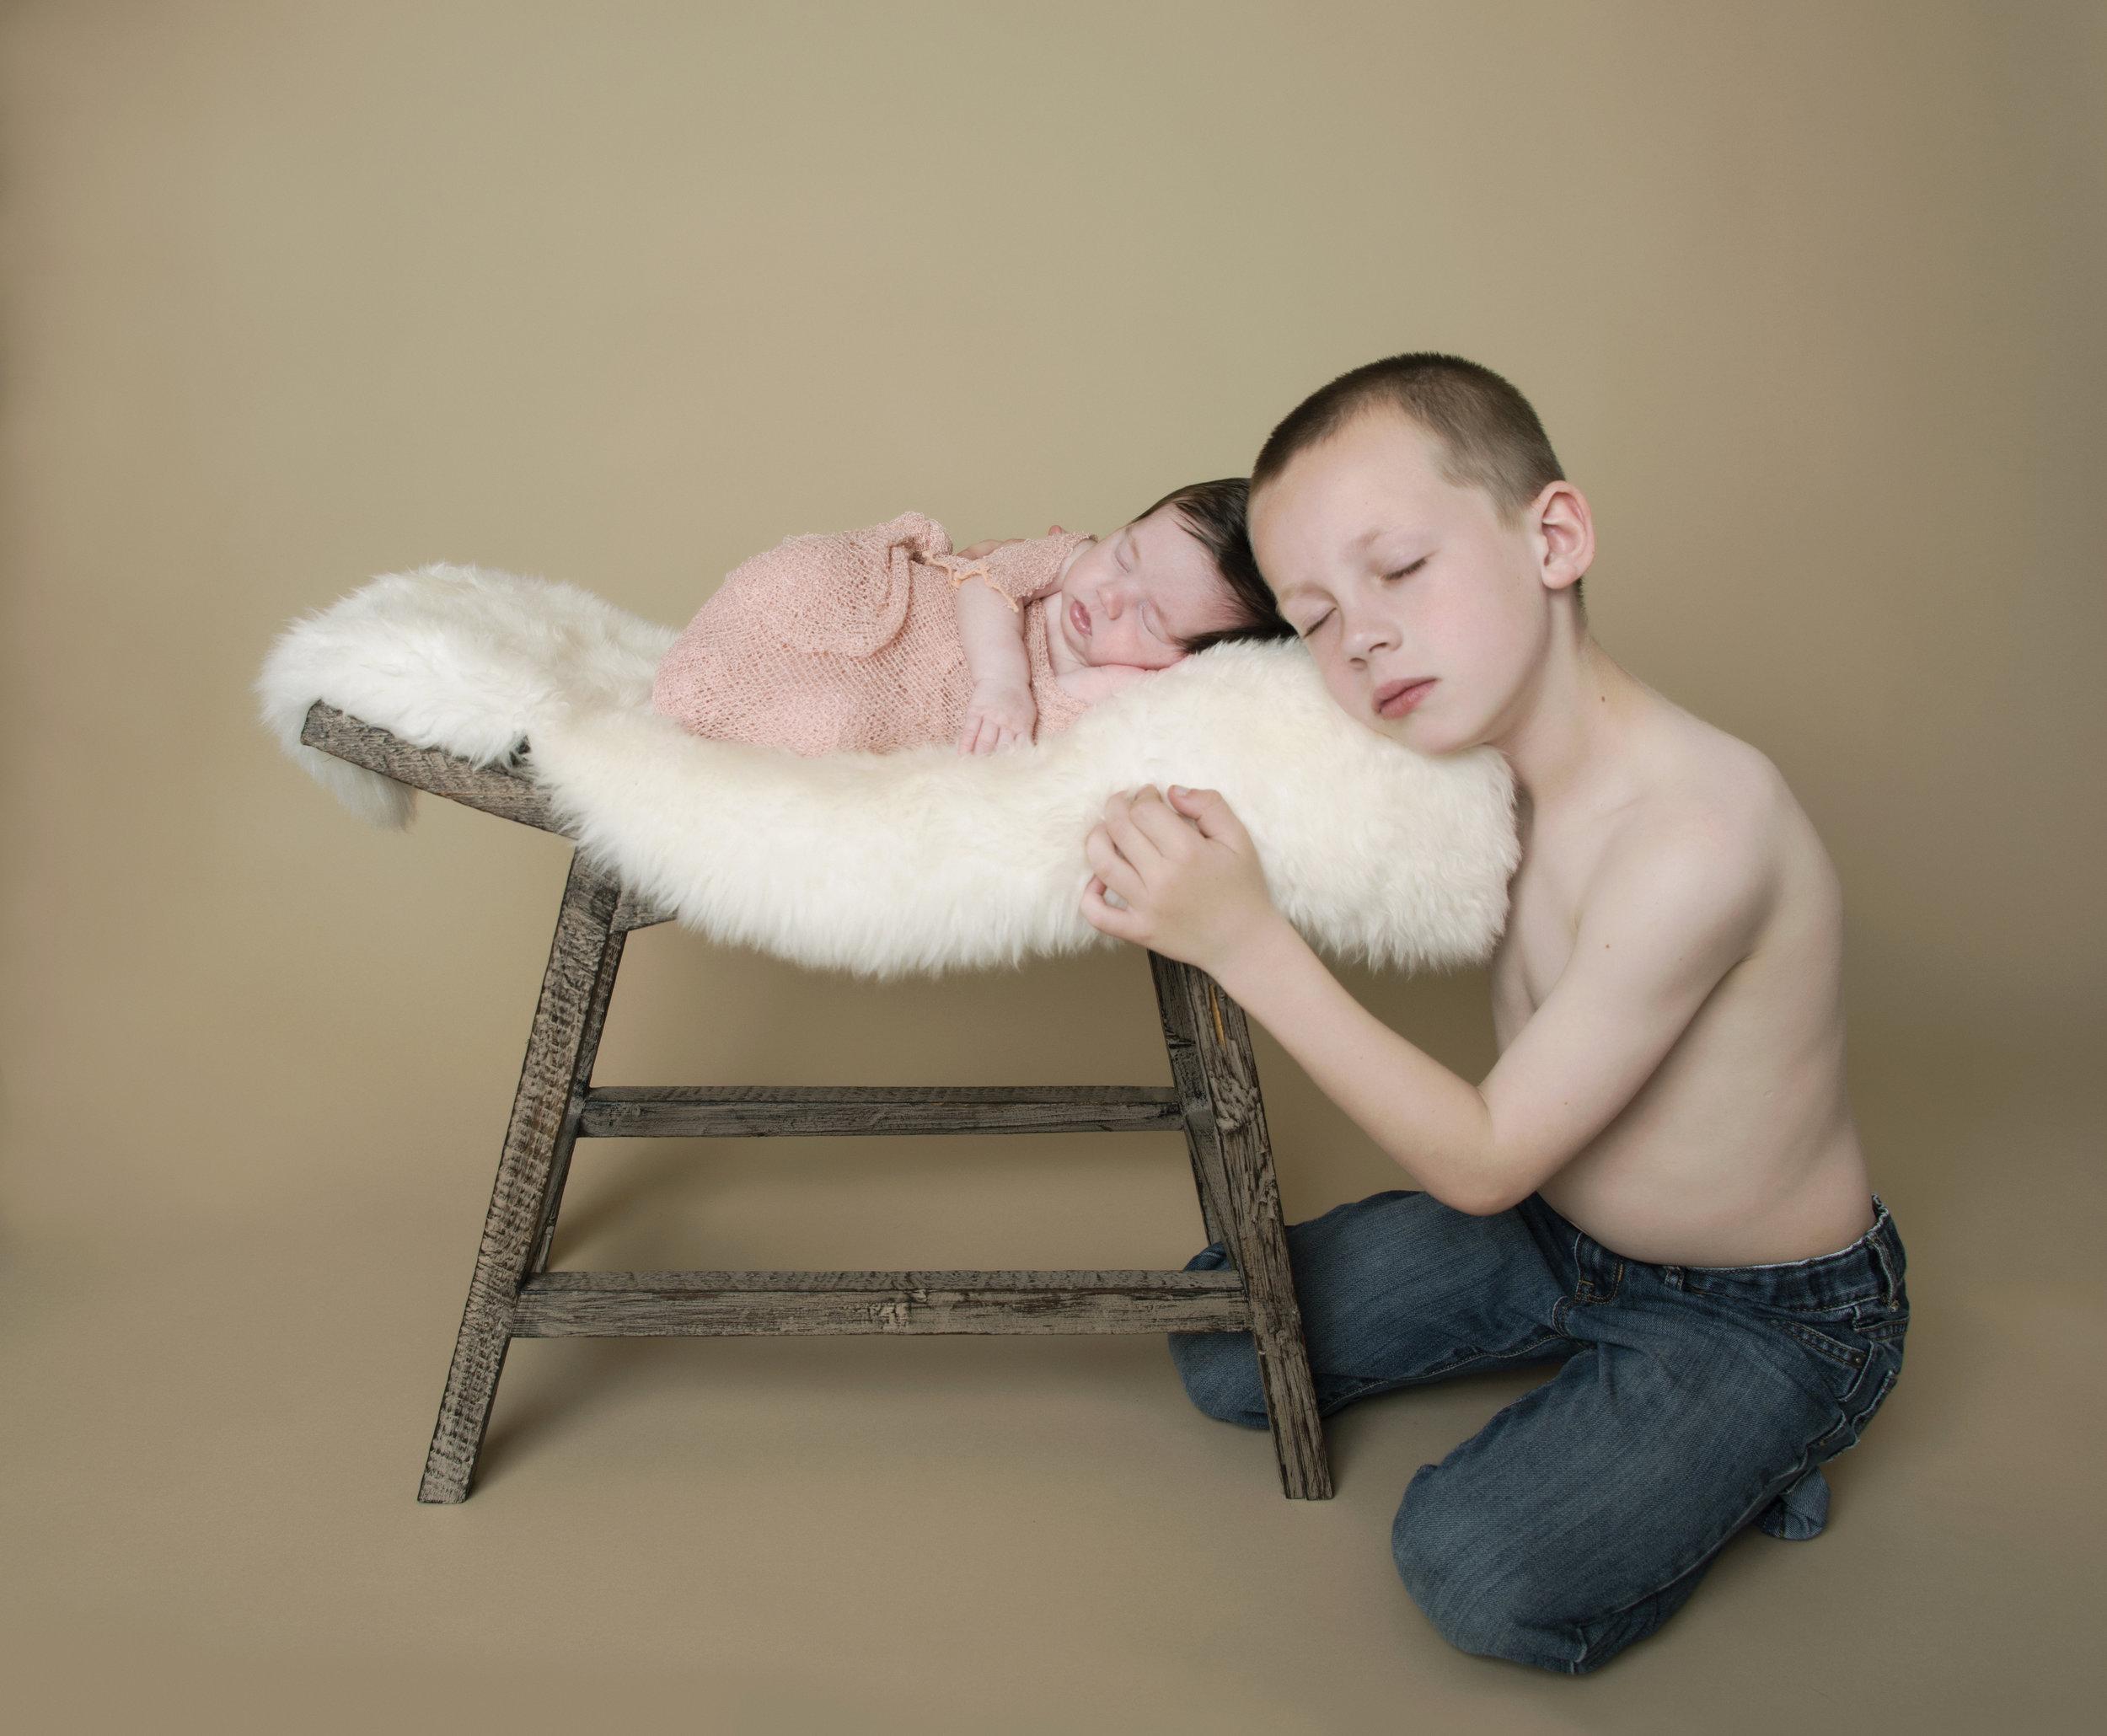 042416_Ward, Evvie_Newborn_Jack_0004.jpg